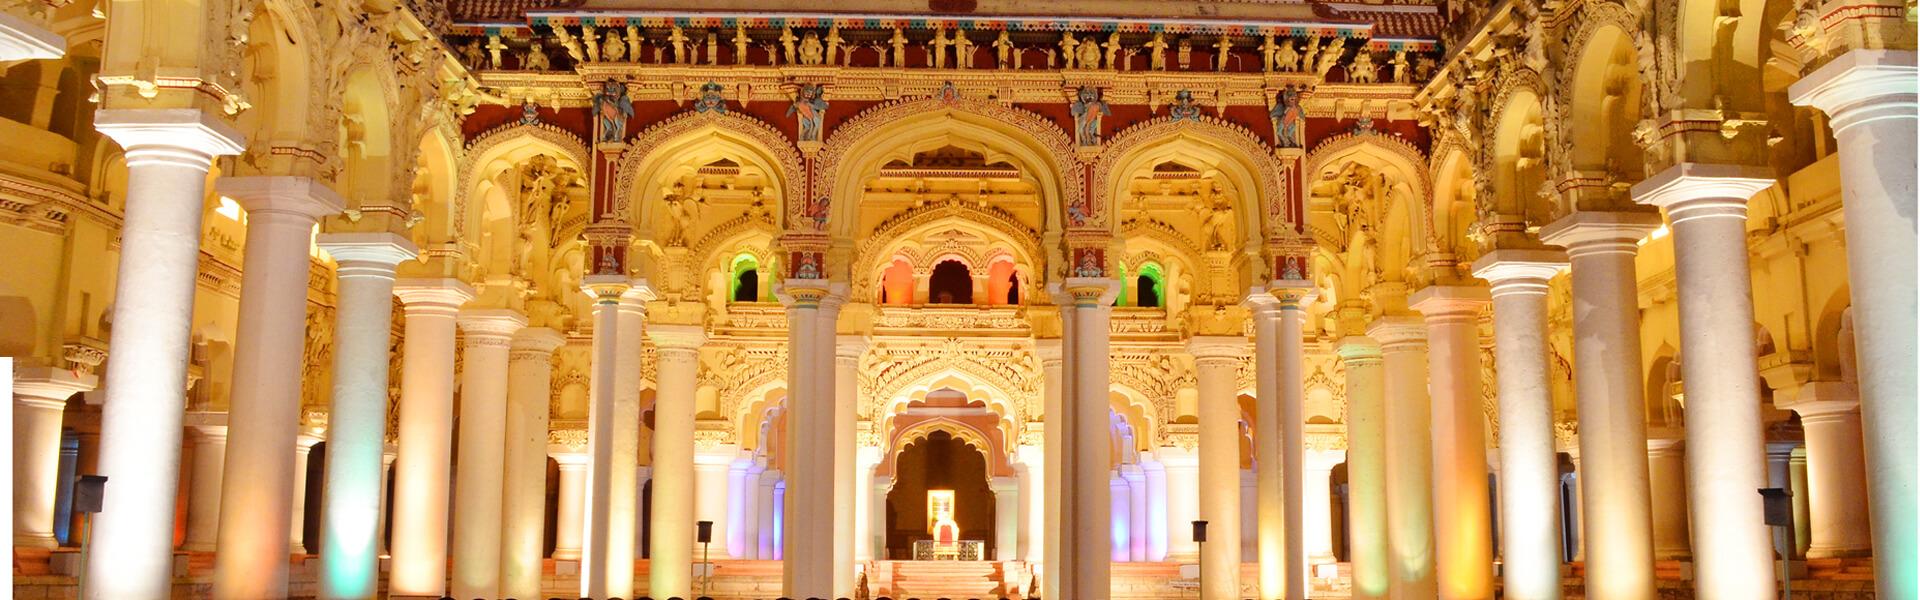 Thirumalai Nayakkar Mahal